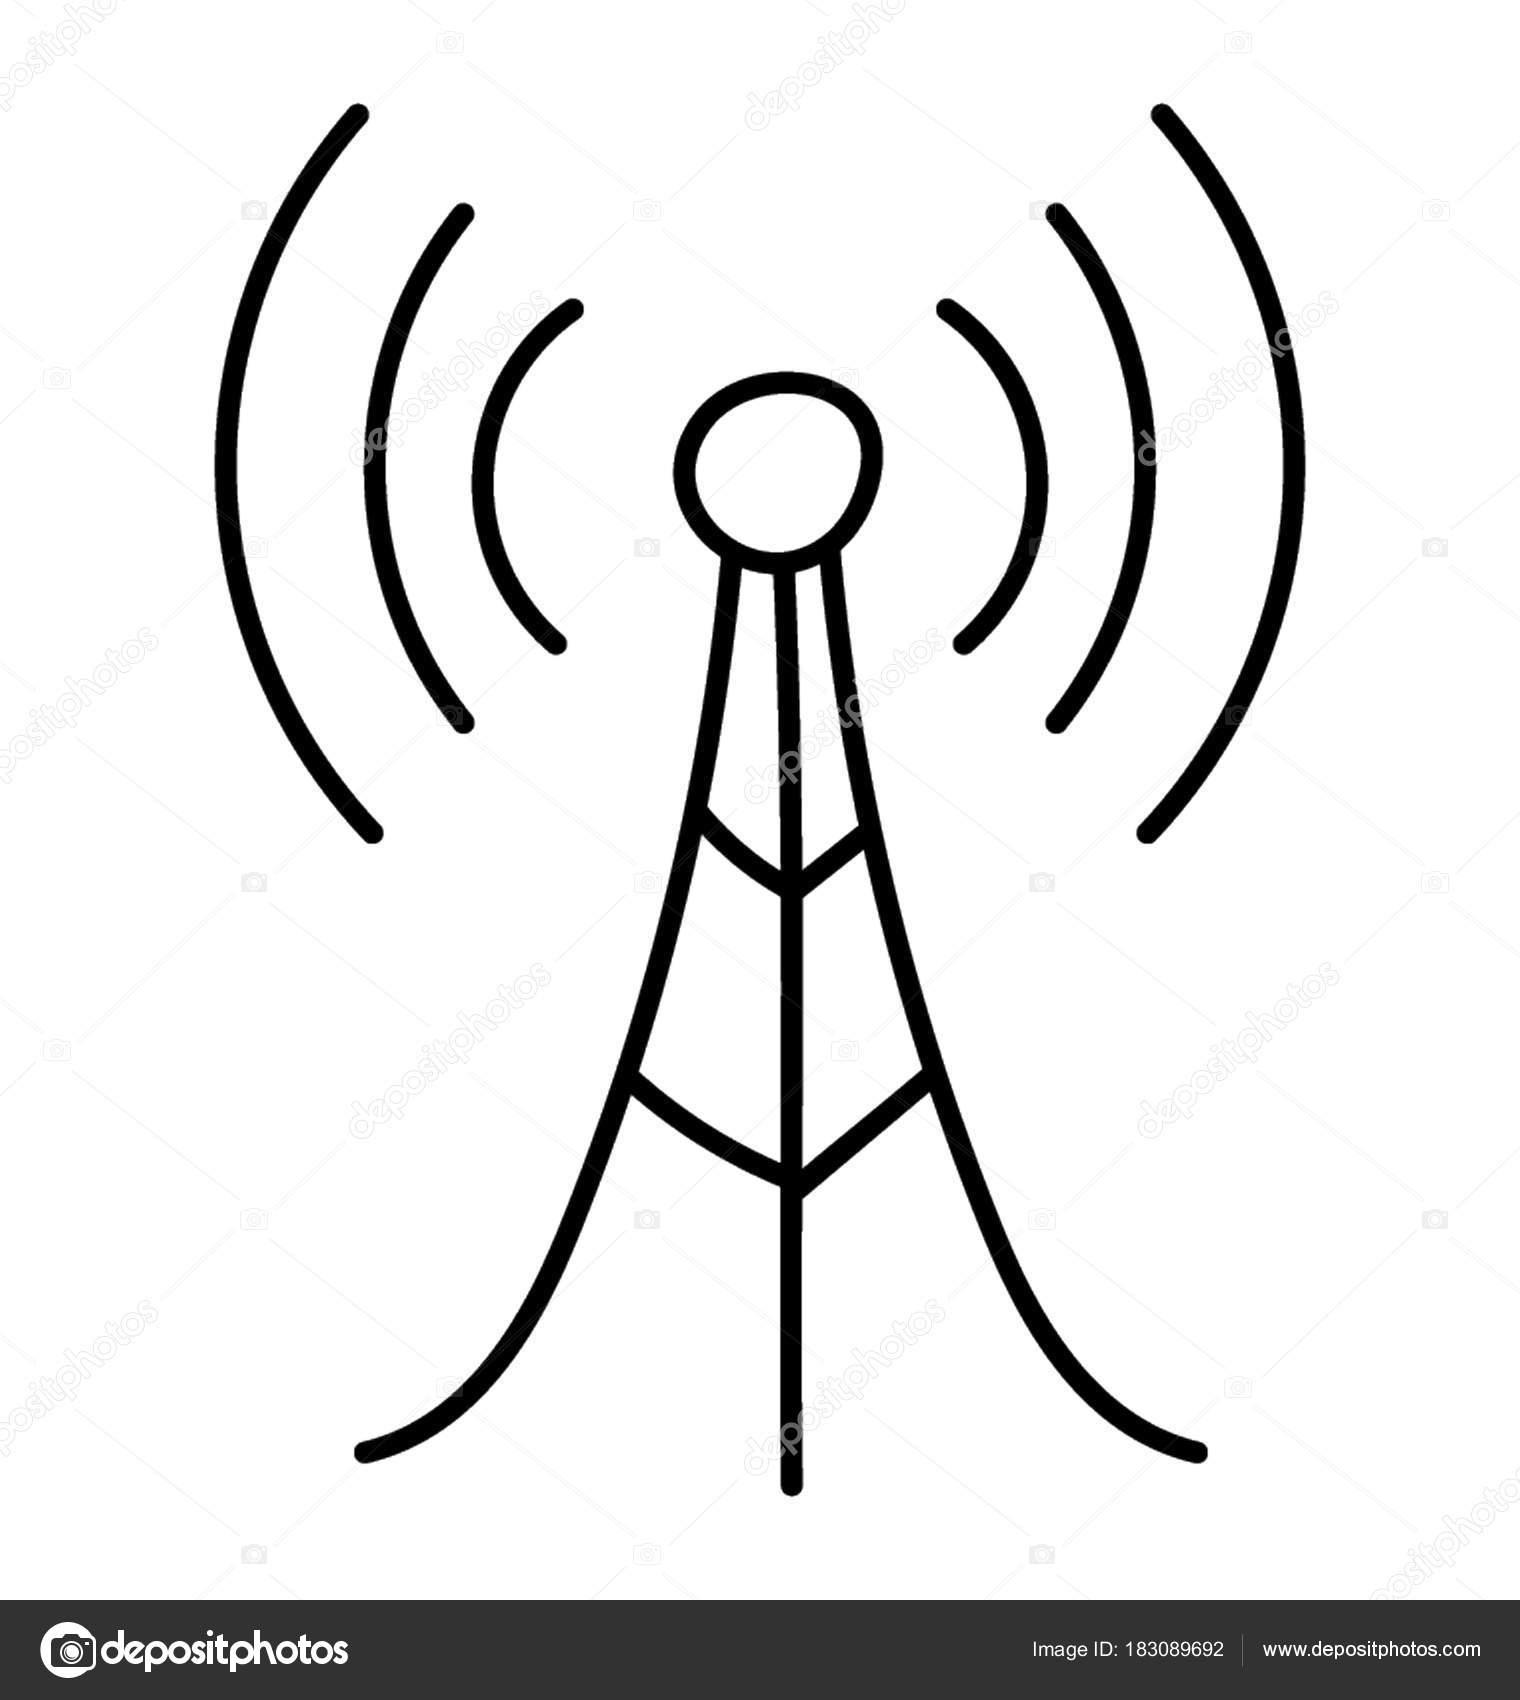 Jednoduche Rucni Kresby Komunikacni Veze Spolu Vln Signal Stock